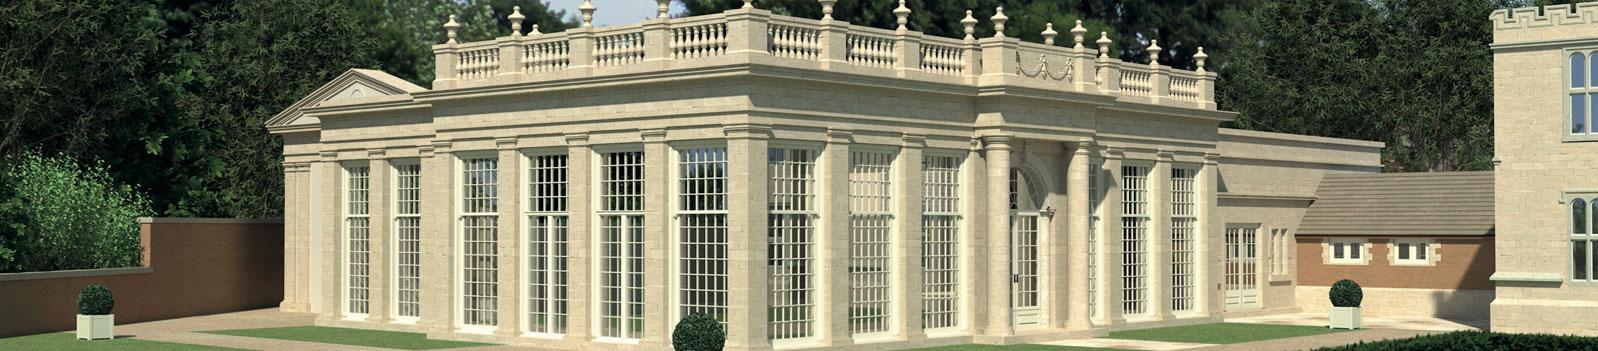 stamford-stone-rushton-hall-orangery